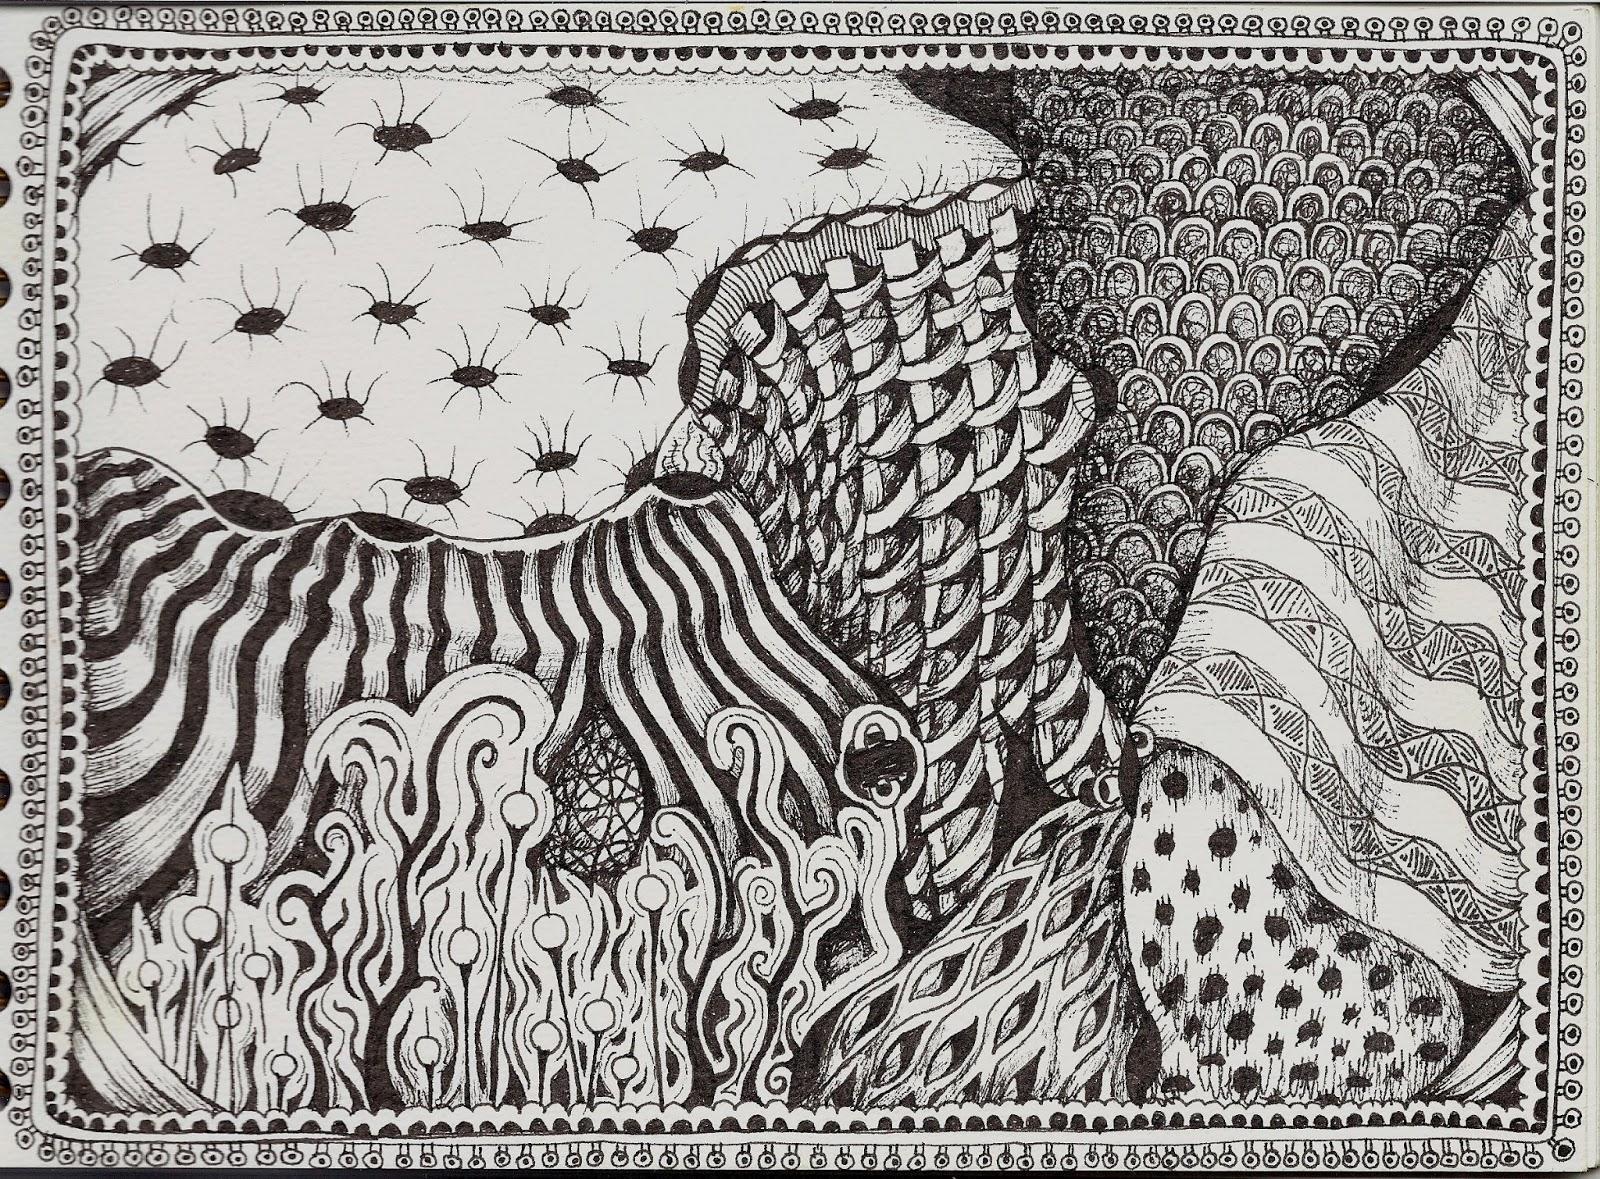 Scribble Line Drawing : Drawing pens life imitates doodles